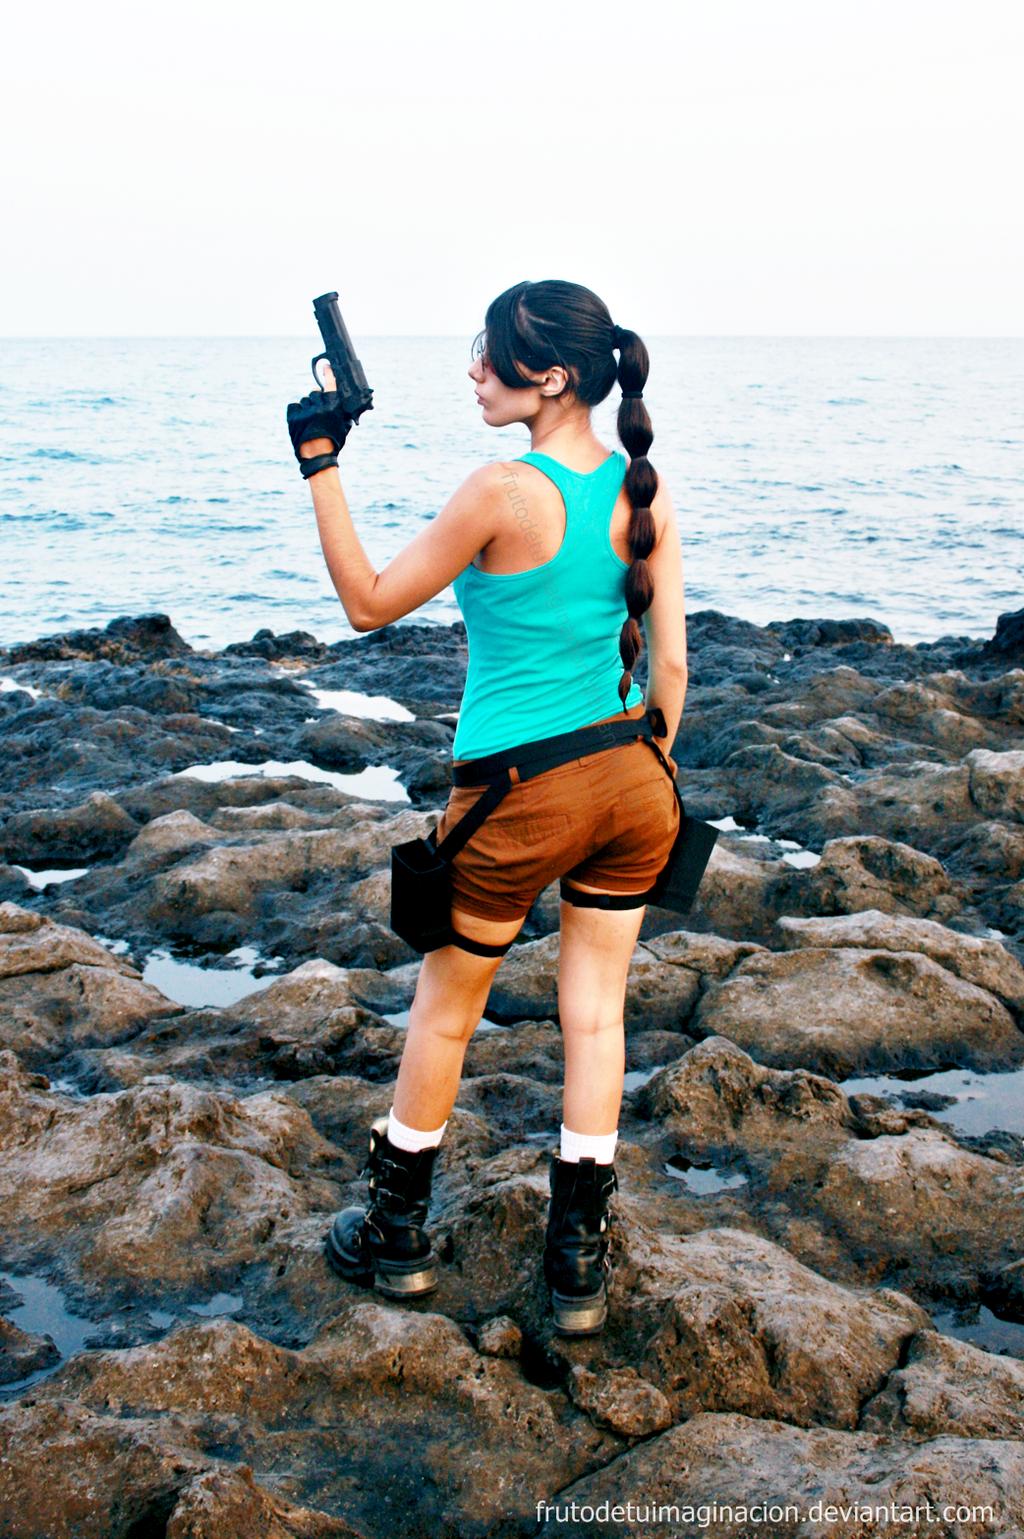 Lara Croft Tomb Raider Back by Frutodetuimaginacion